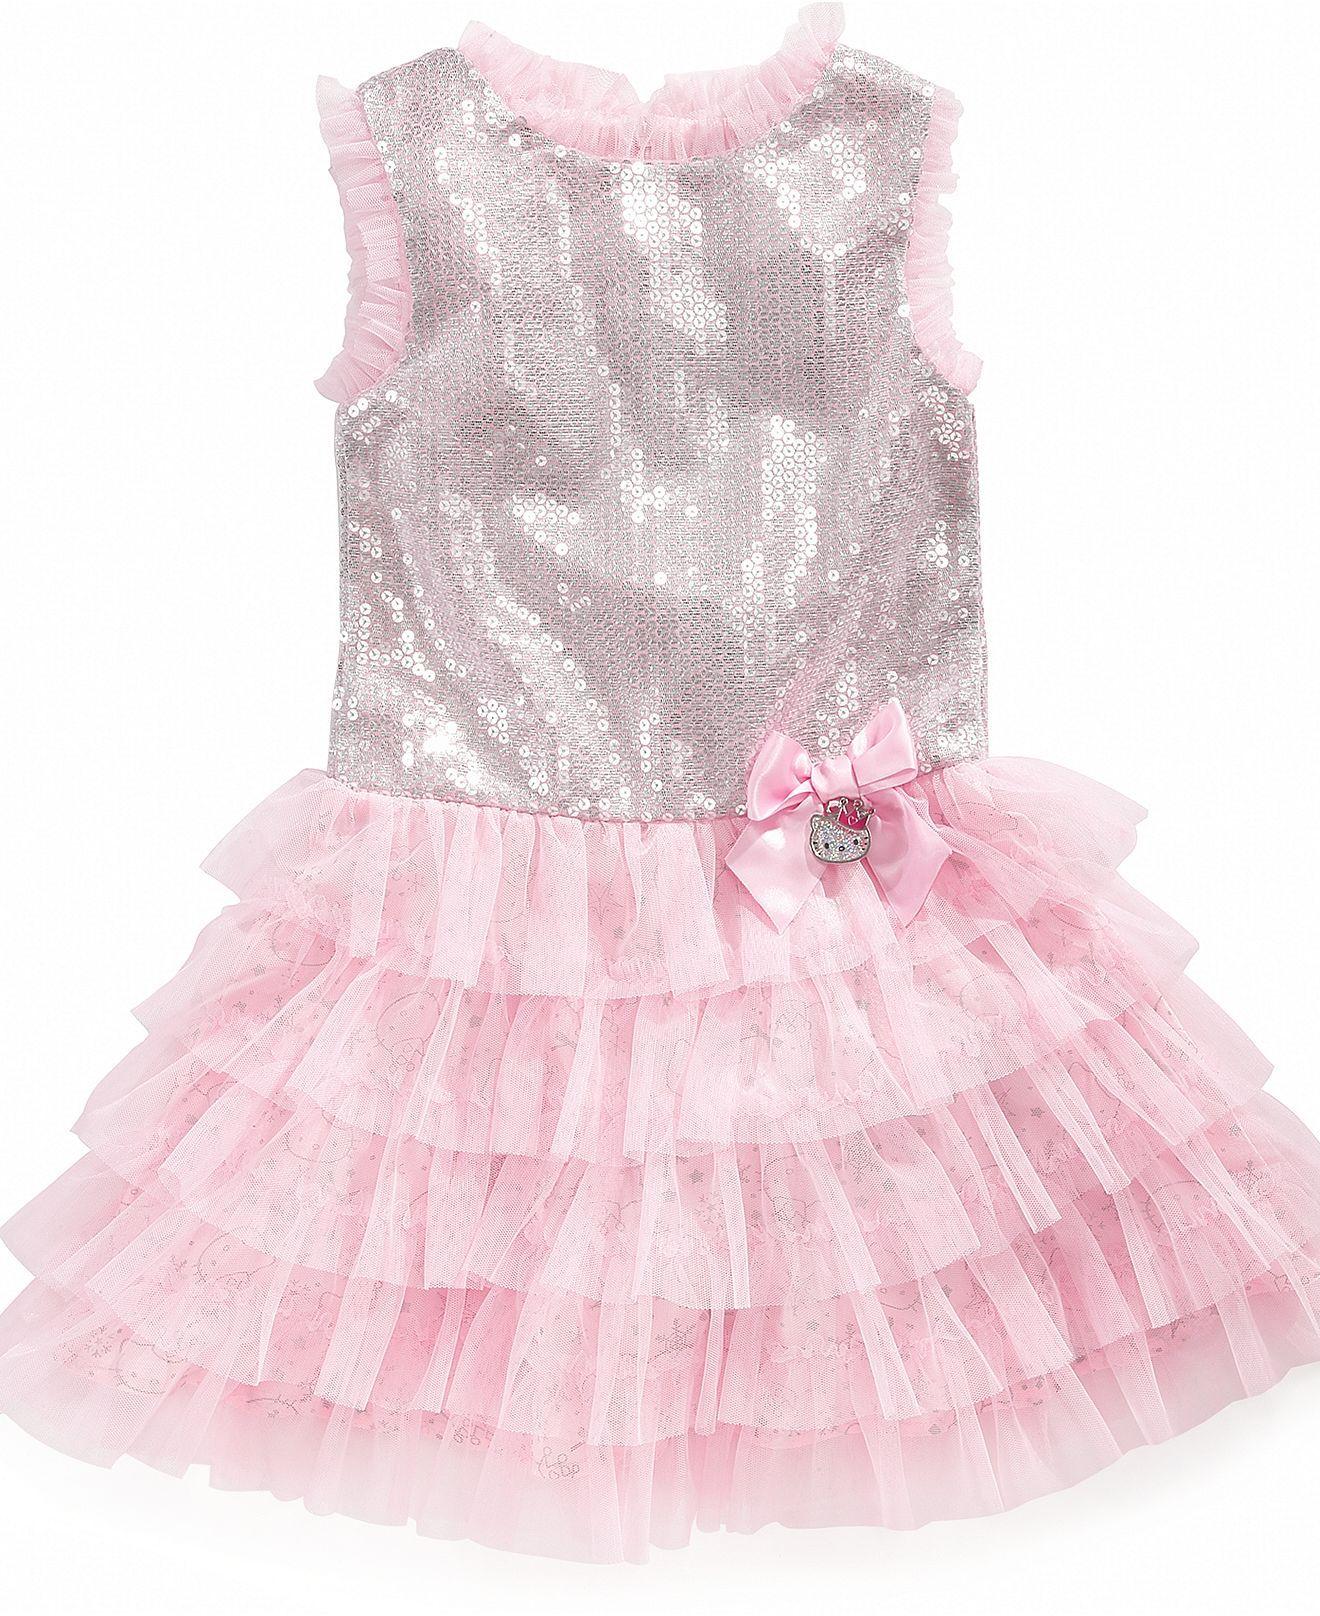 Easter Dress Hello Kitty Kids Dress Little Girl Tiered